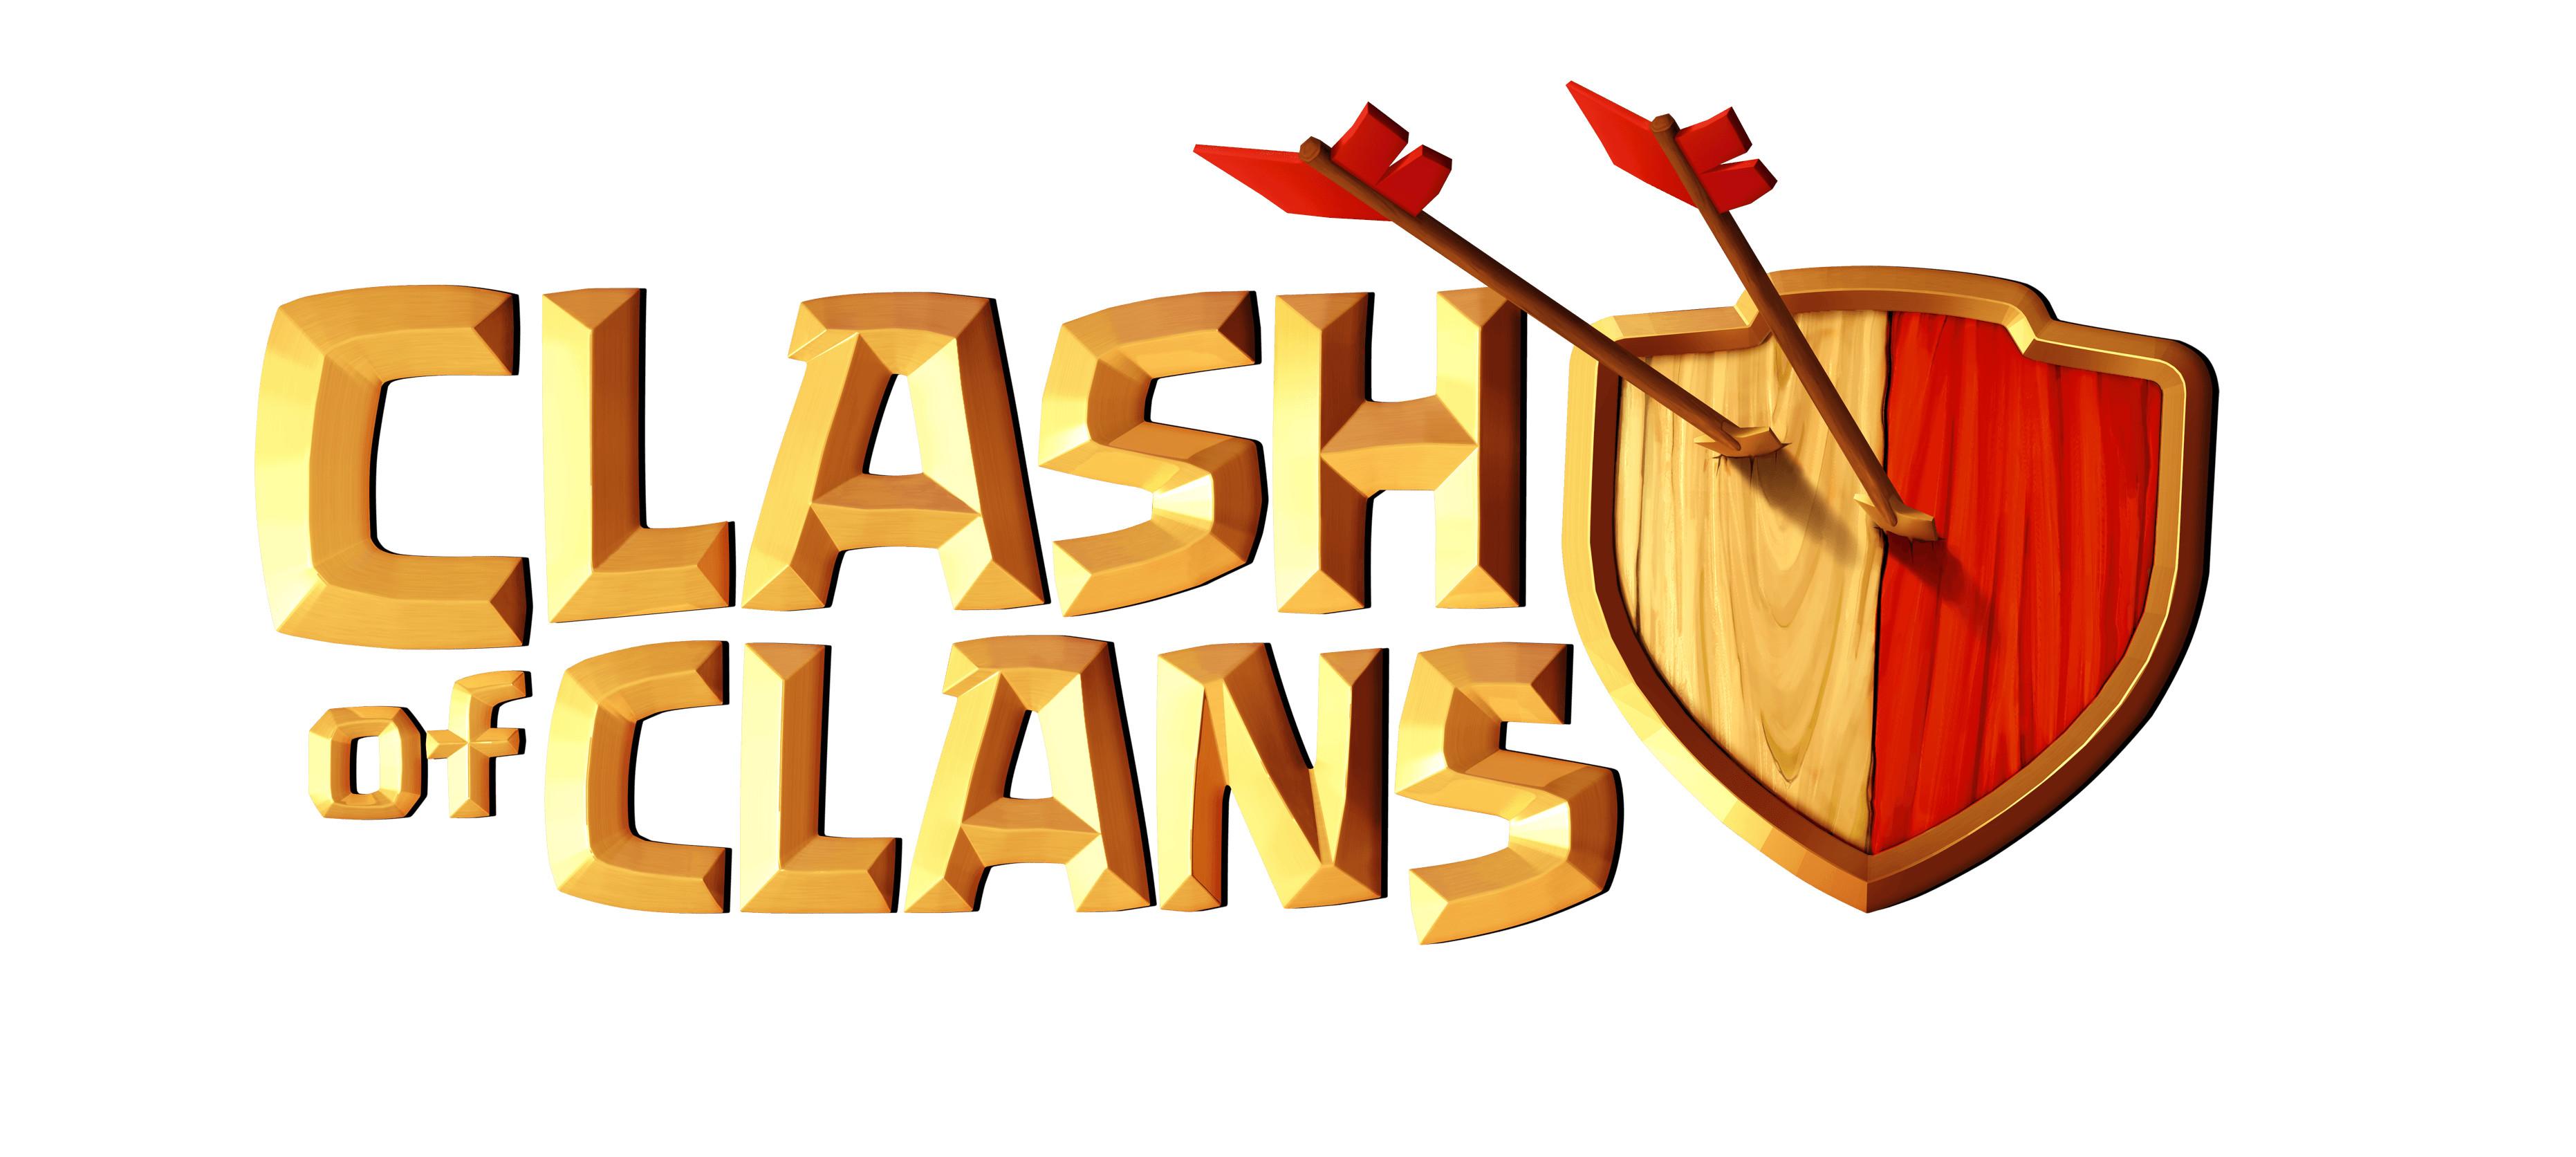 … Clash of Clans 6 …